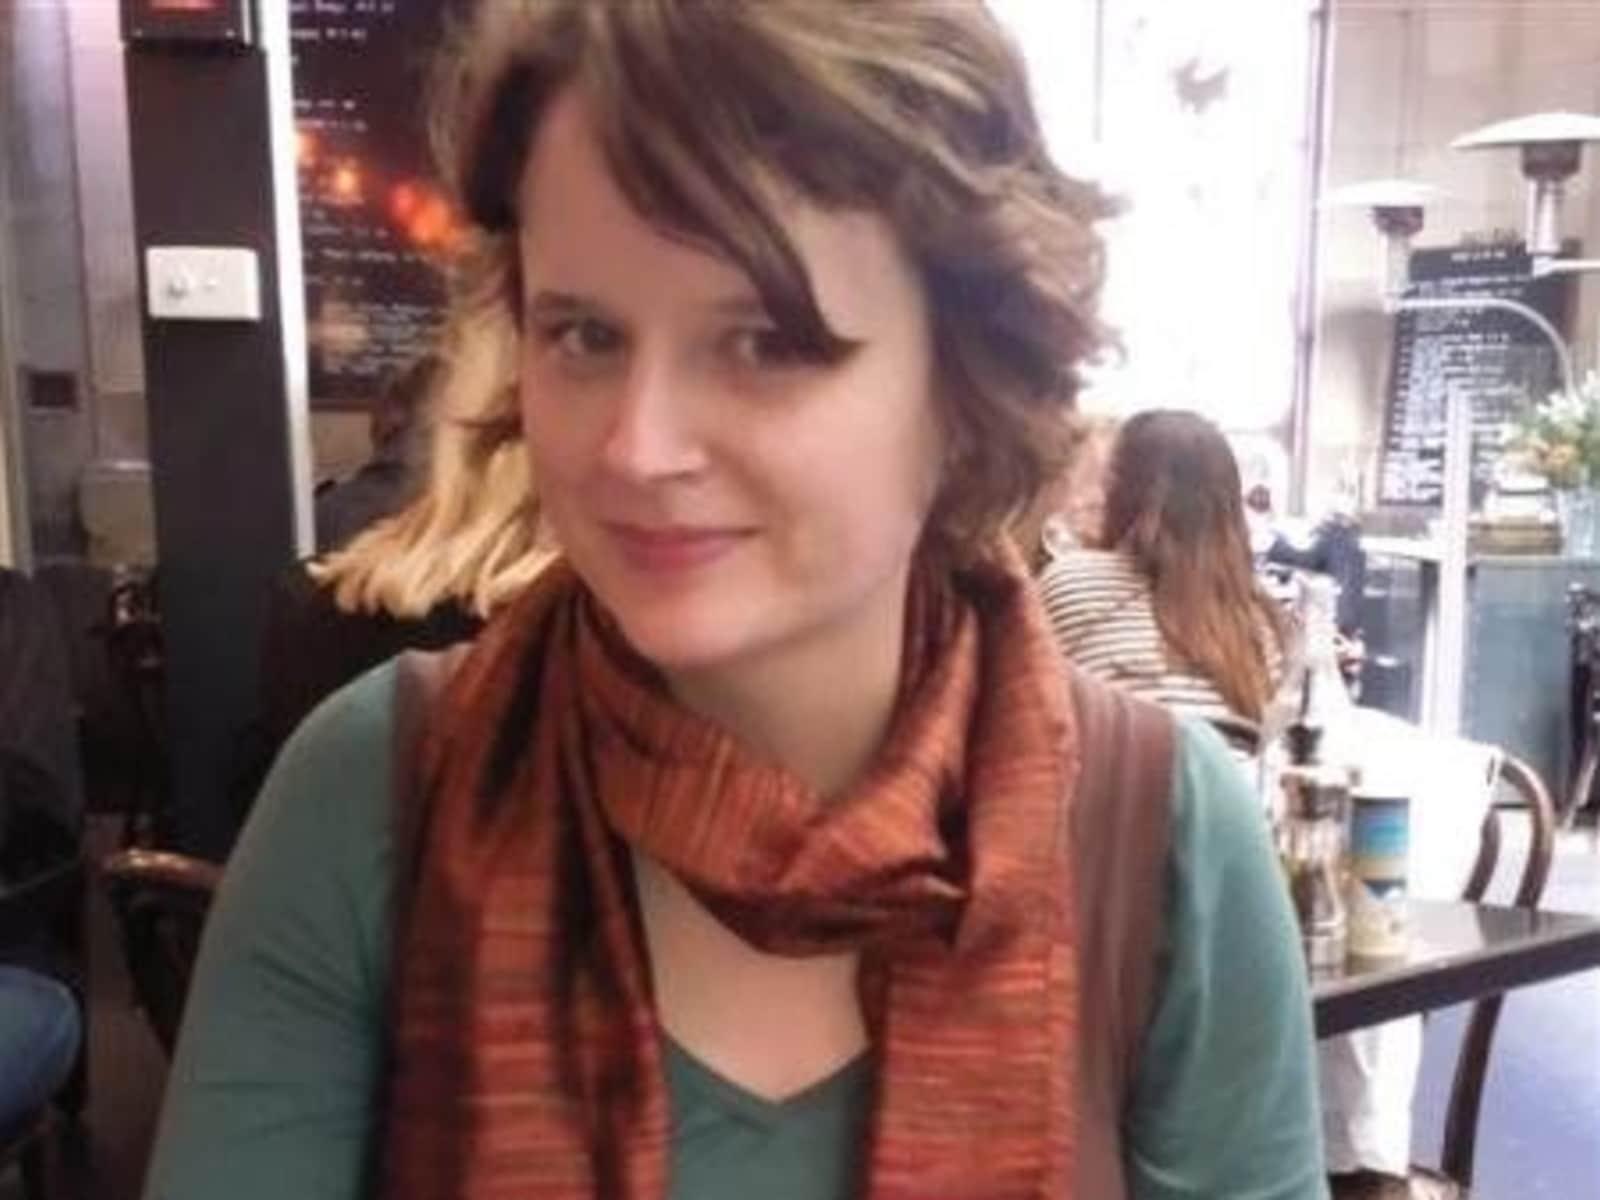 Susannah from Melbourne, Victoria, Australia